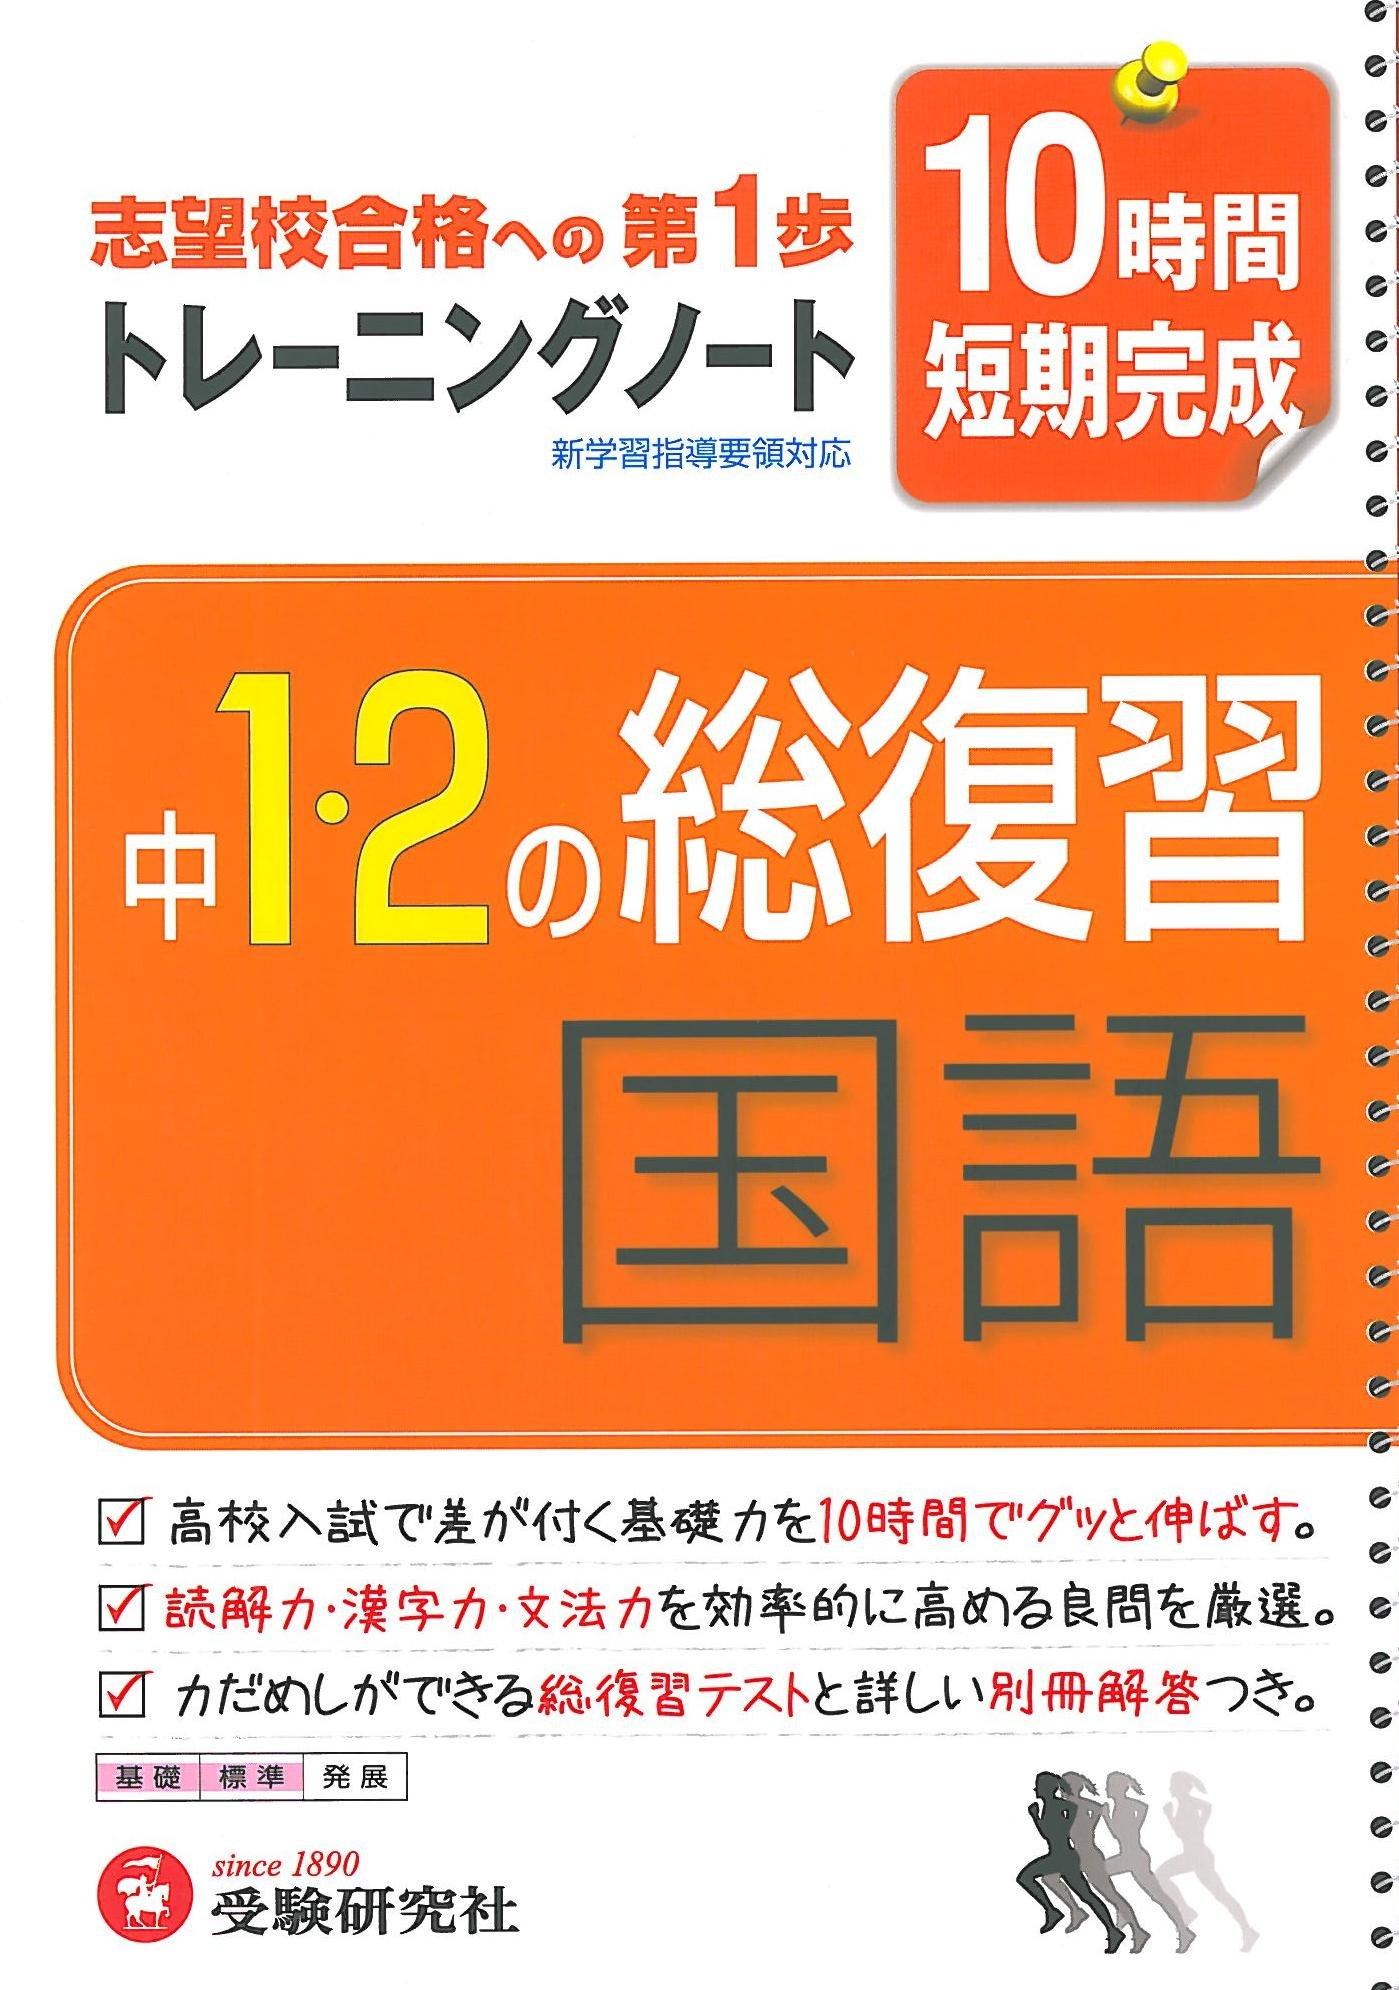 Download Chūichi ni no sōfukushū kokugo torēningu nōto : jūjikan tanki kansei PDF